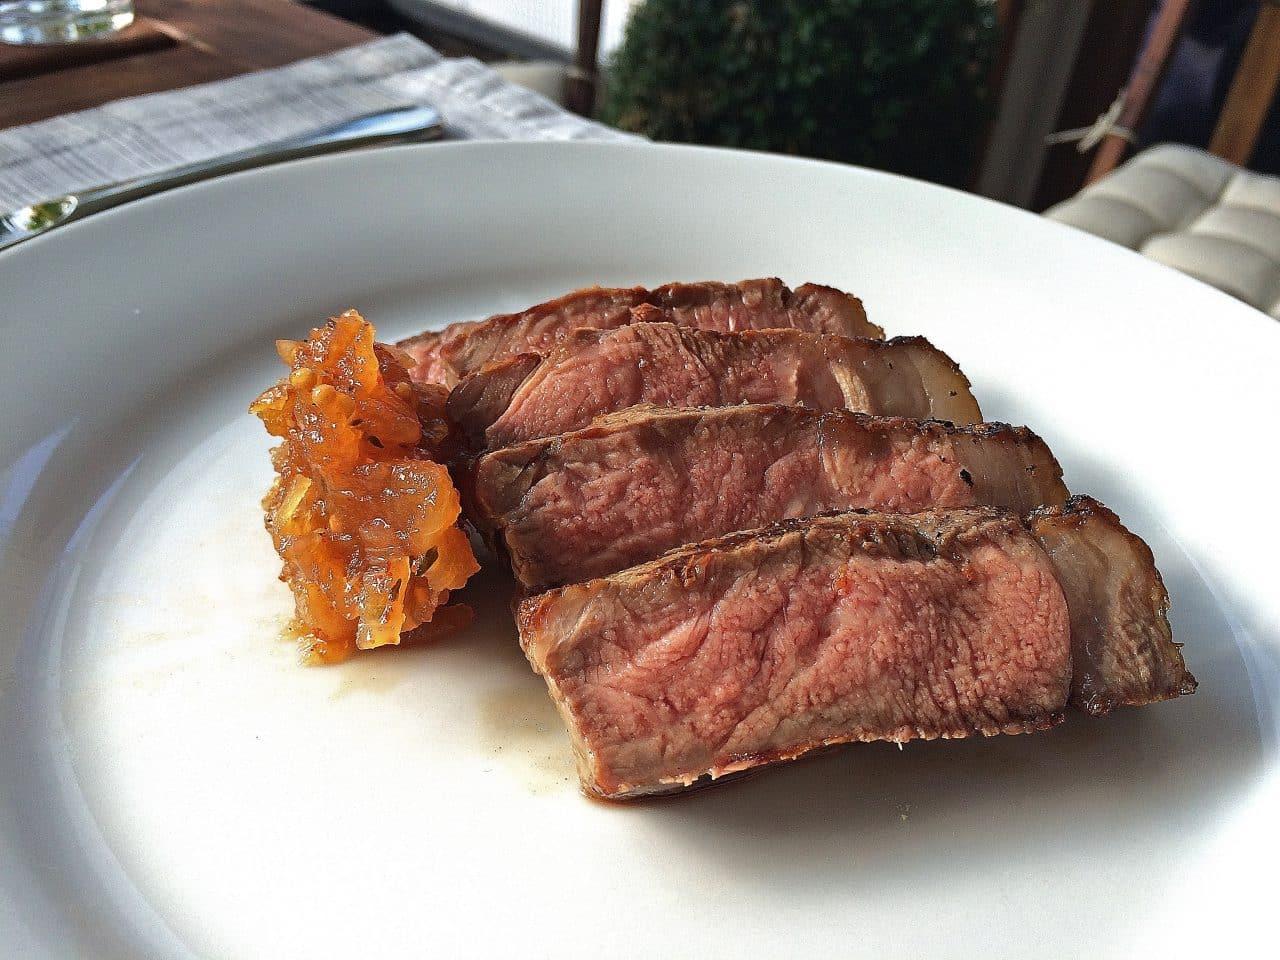 Enders Gasgrill Rezepte : Steaks vom gasgrill so gehts